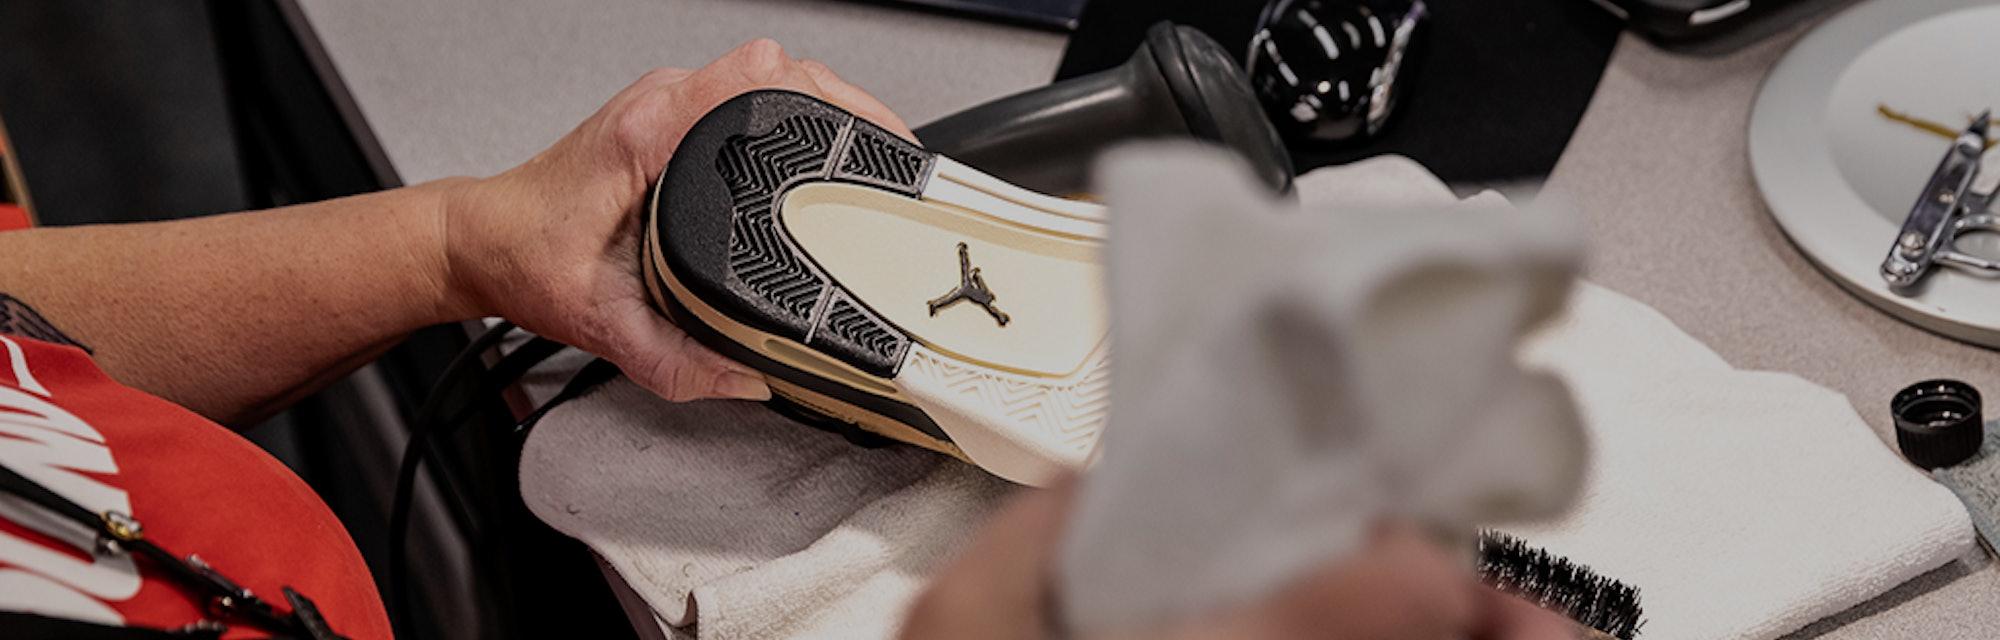 Nike Refurbished process